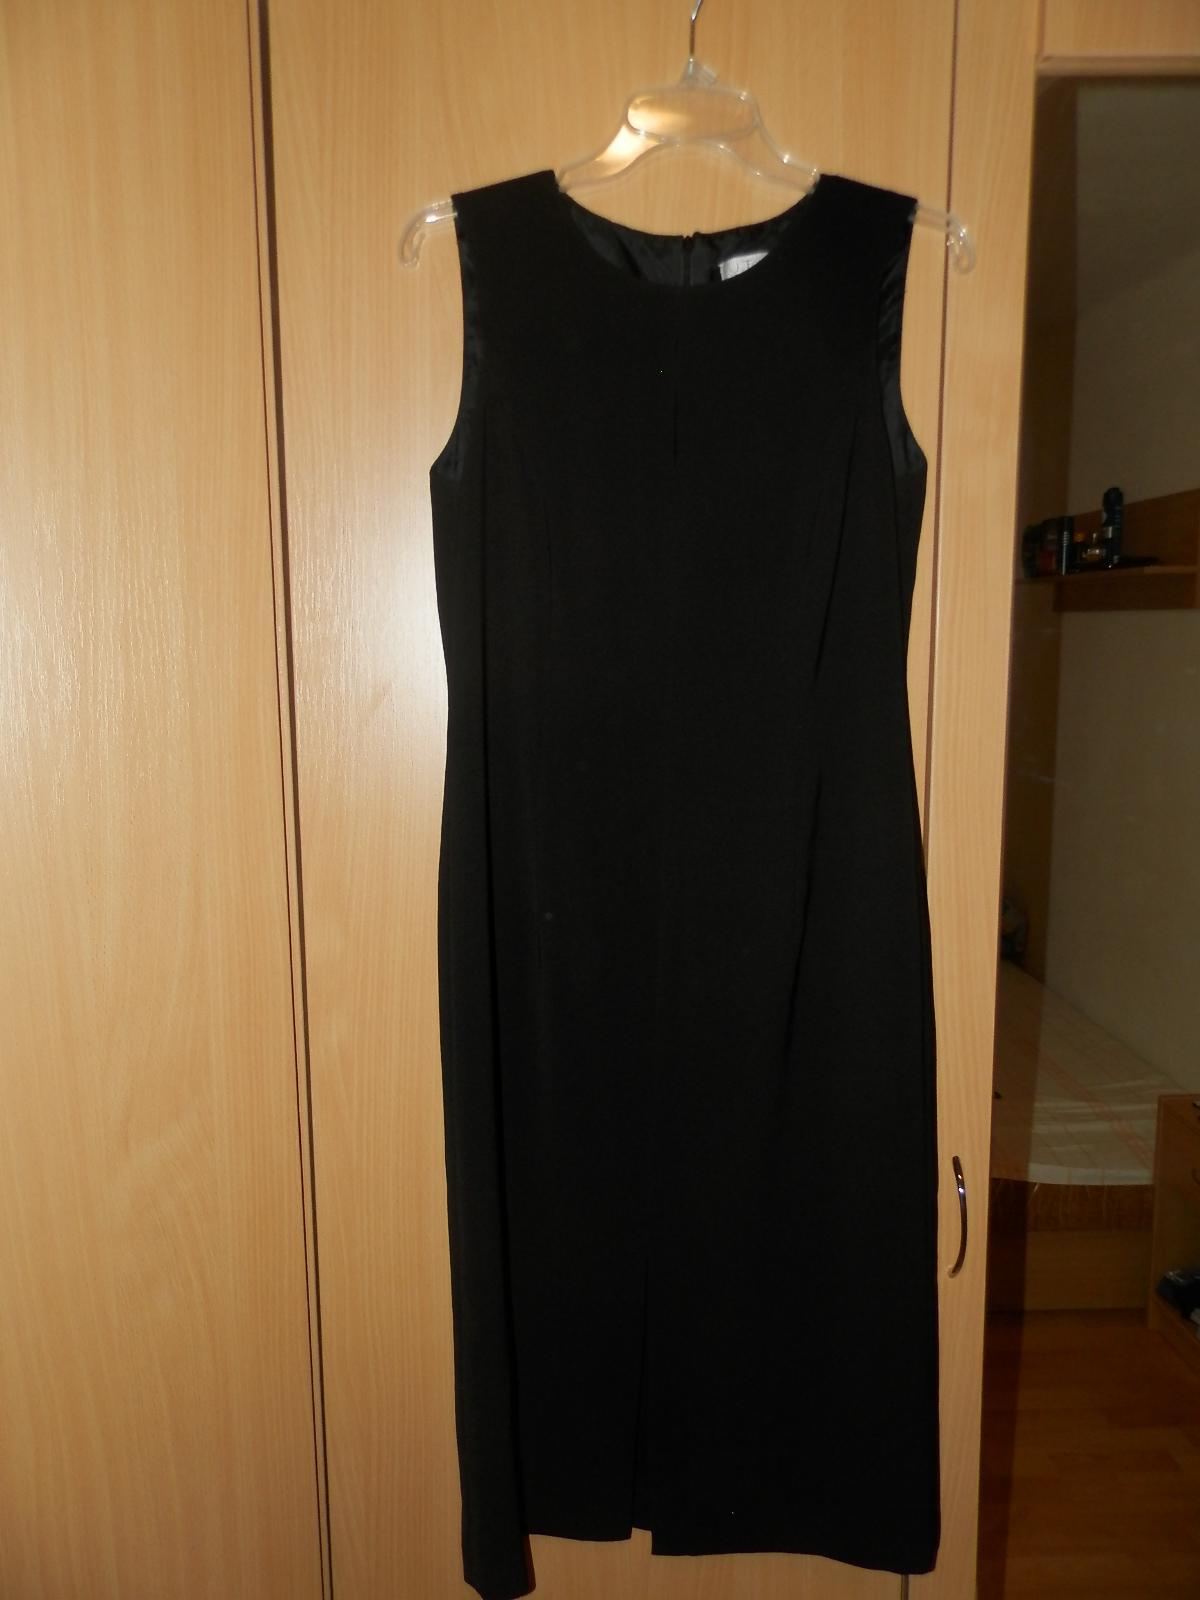 J.TAYLOR elegantné šaty M/L - Obrázok č. 1